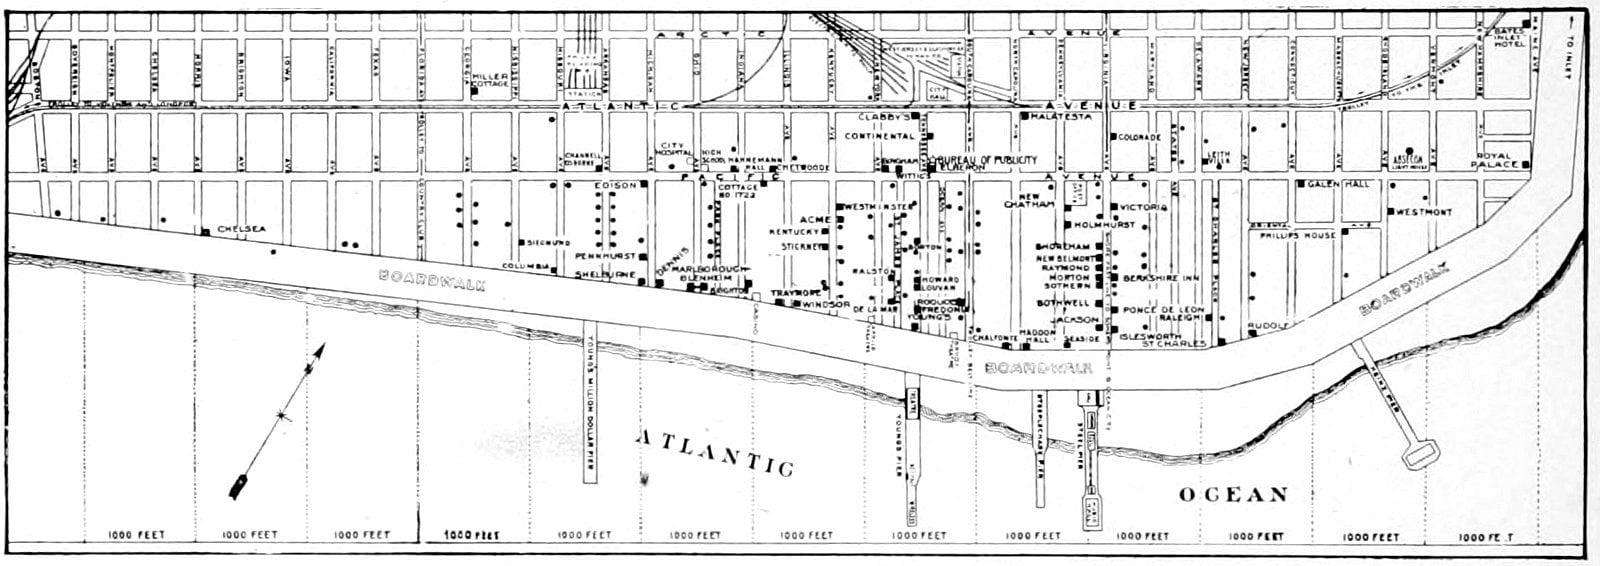 Old Atlantic City map (1911)